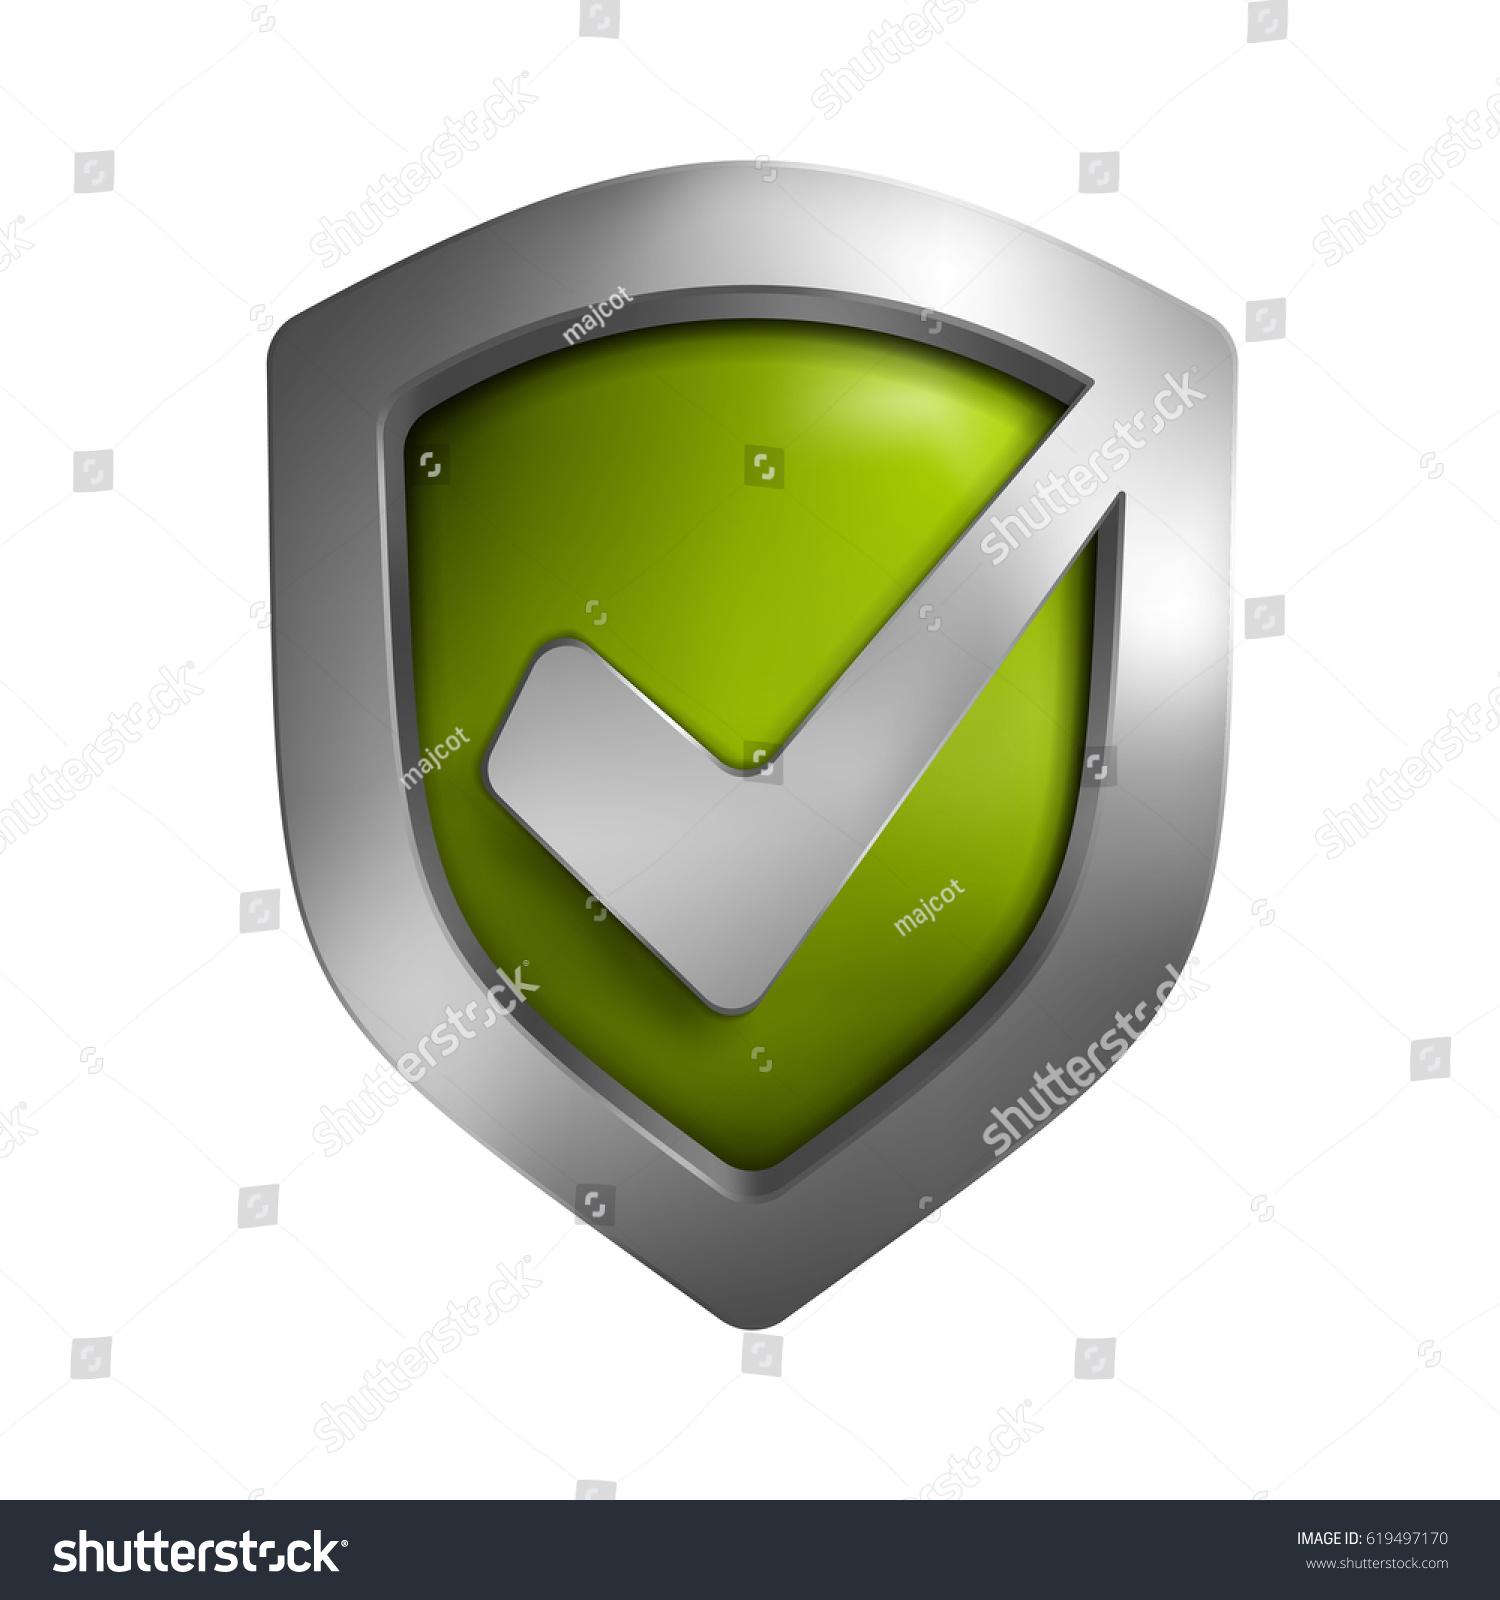 Secure website symbol images symbol and sign ideas security shield symbol 3d illustration isolated stock illustration security shield symbol 3d illustration isolated on background biocorpaavc